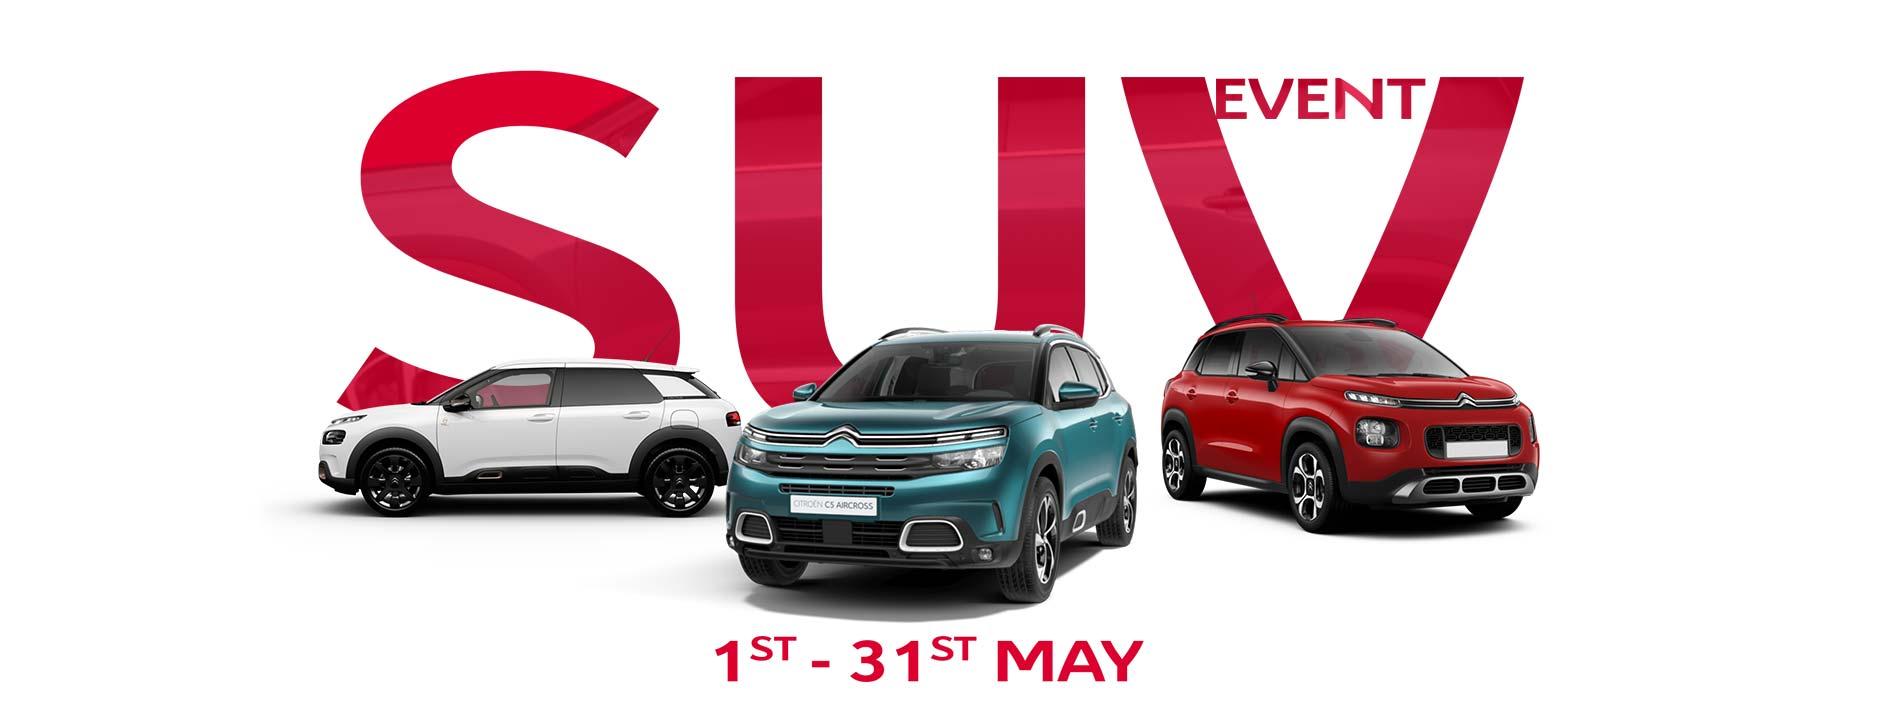 charters-citroen-aldershot-suv-event-may-2019-m-sli